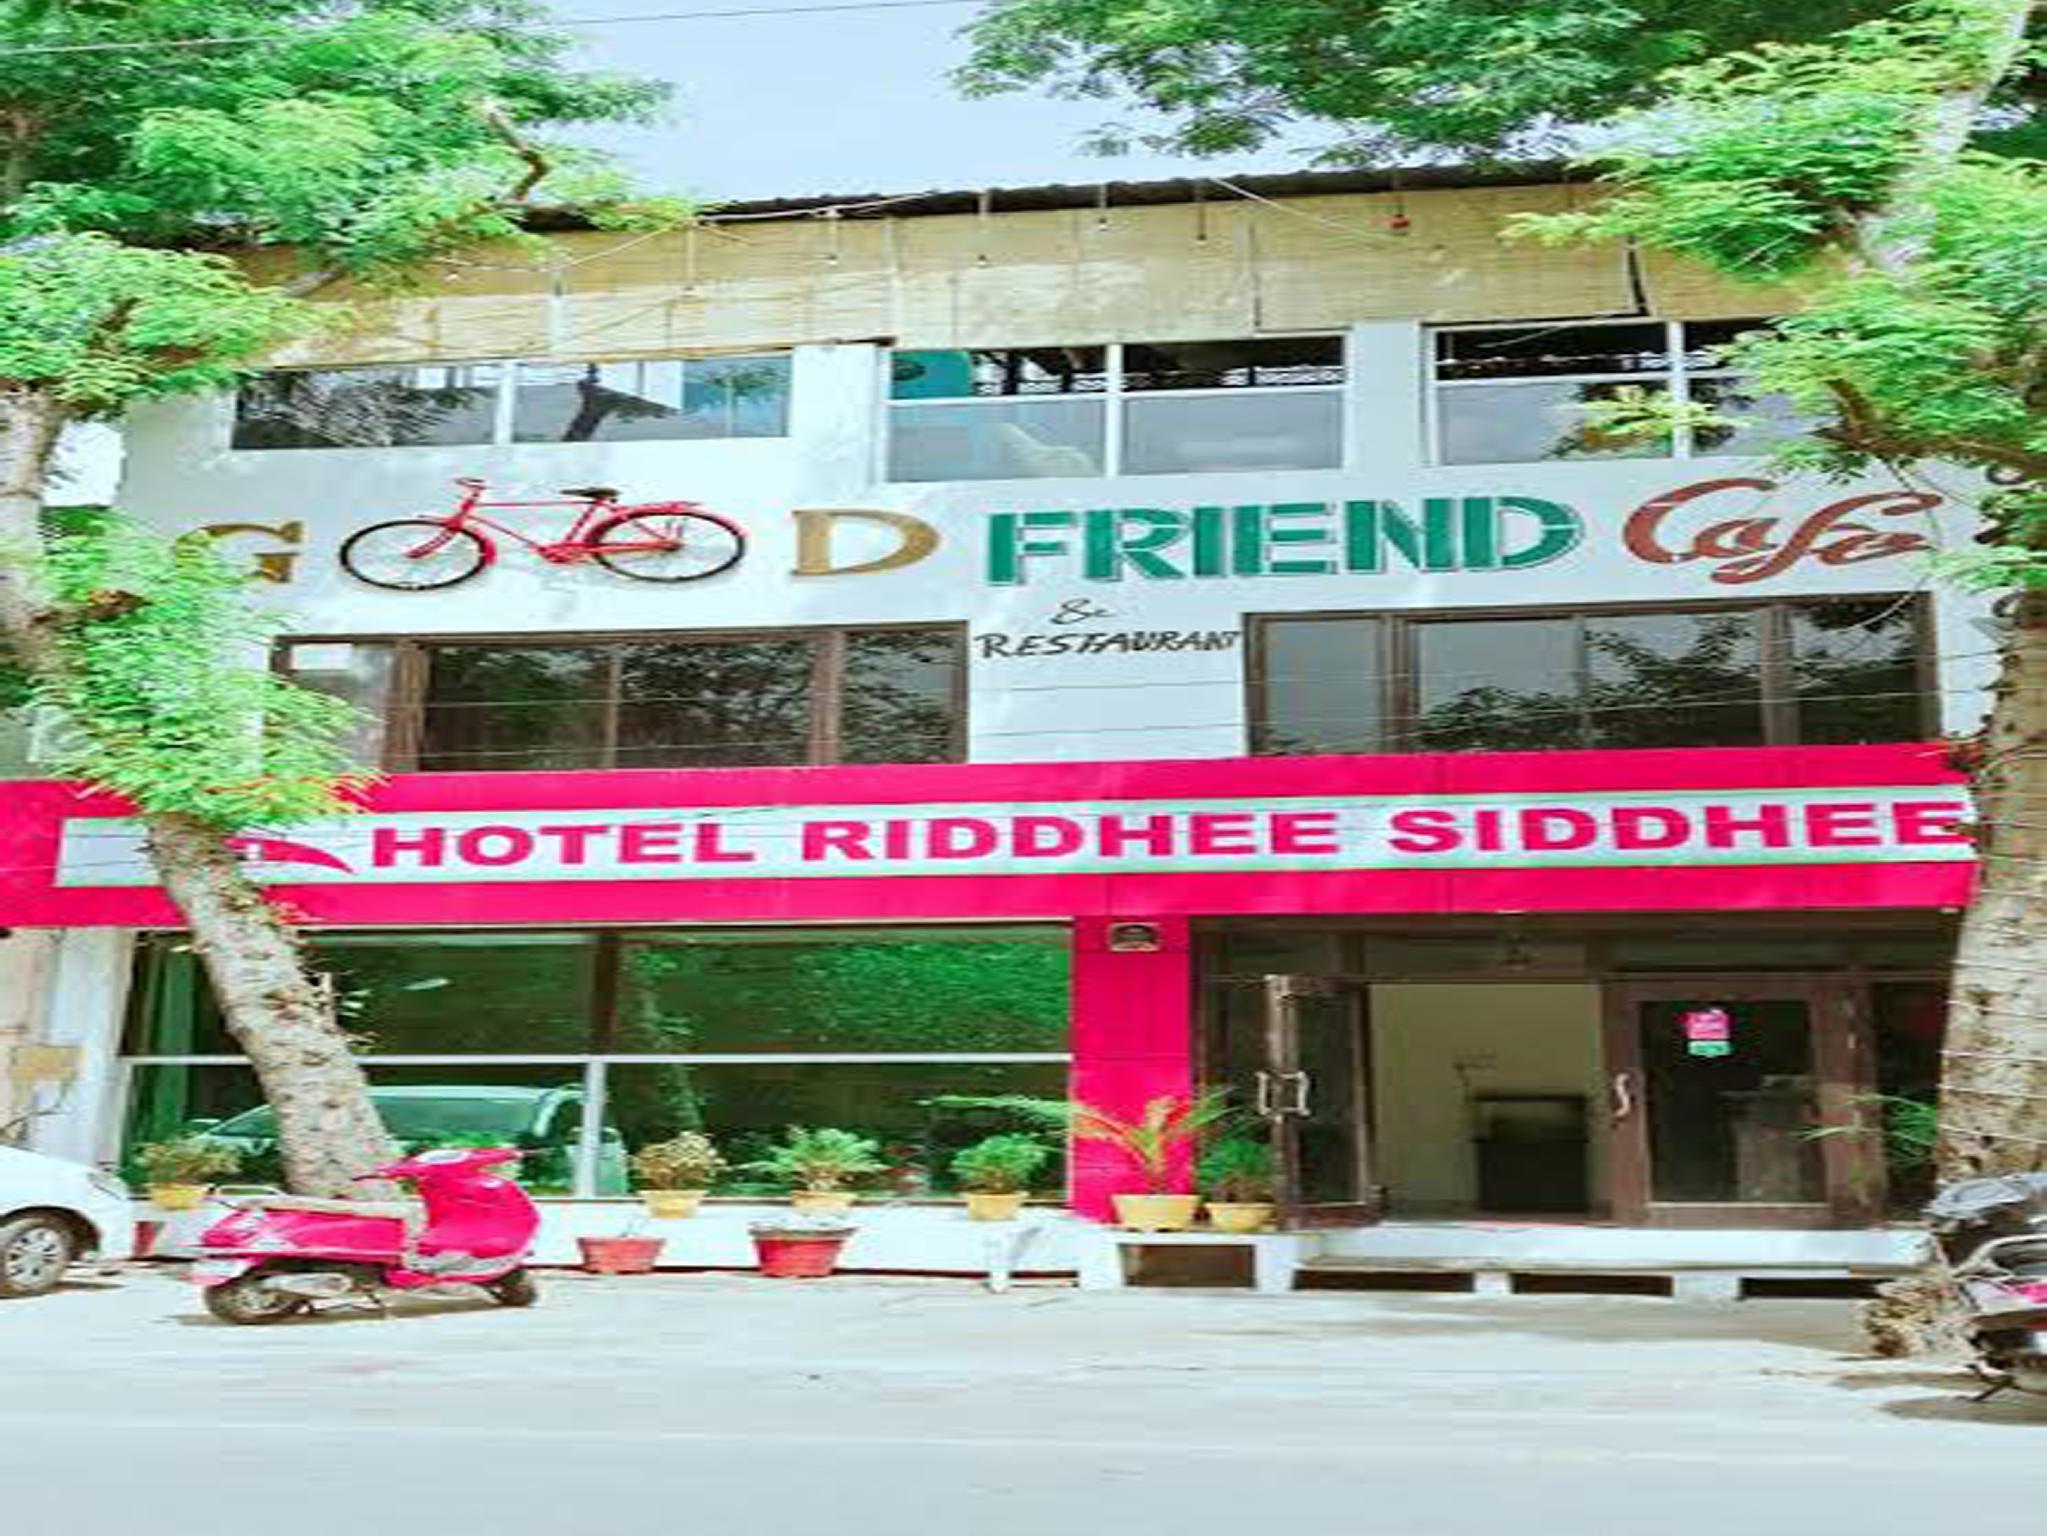 Hotel Riddhee Siddhee